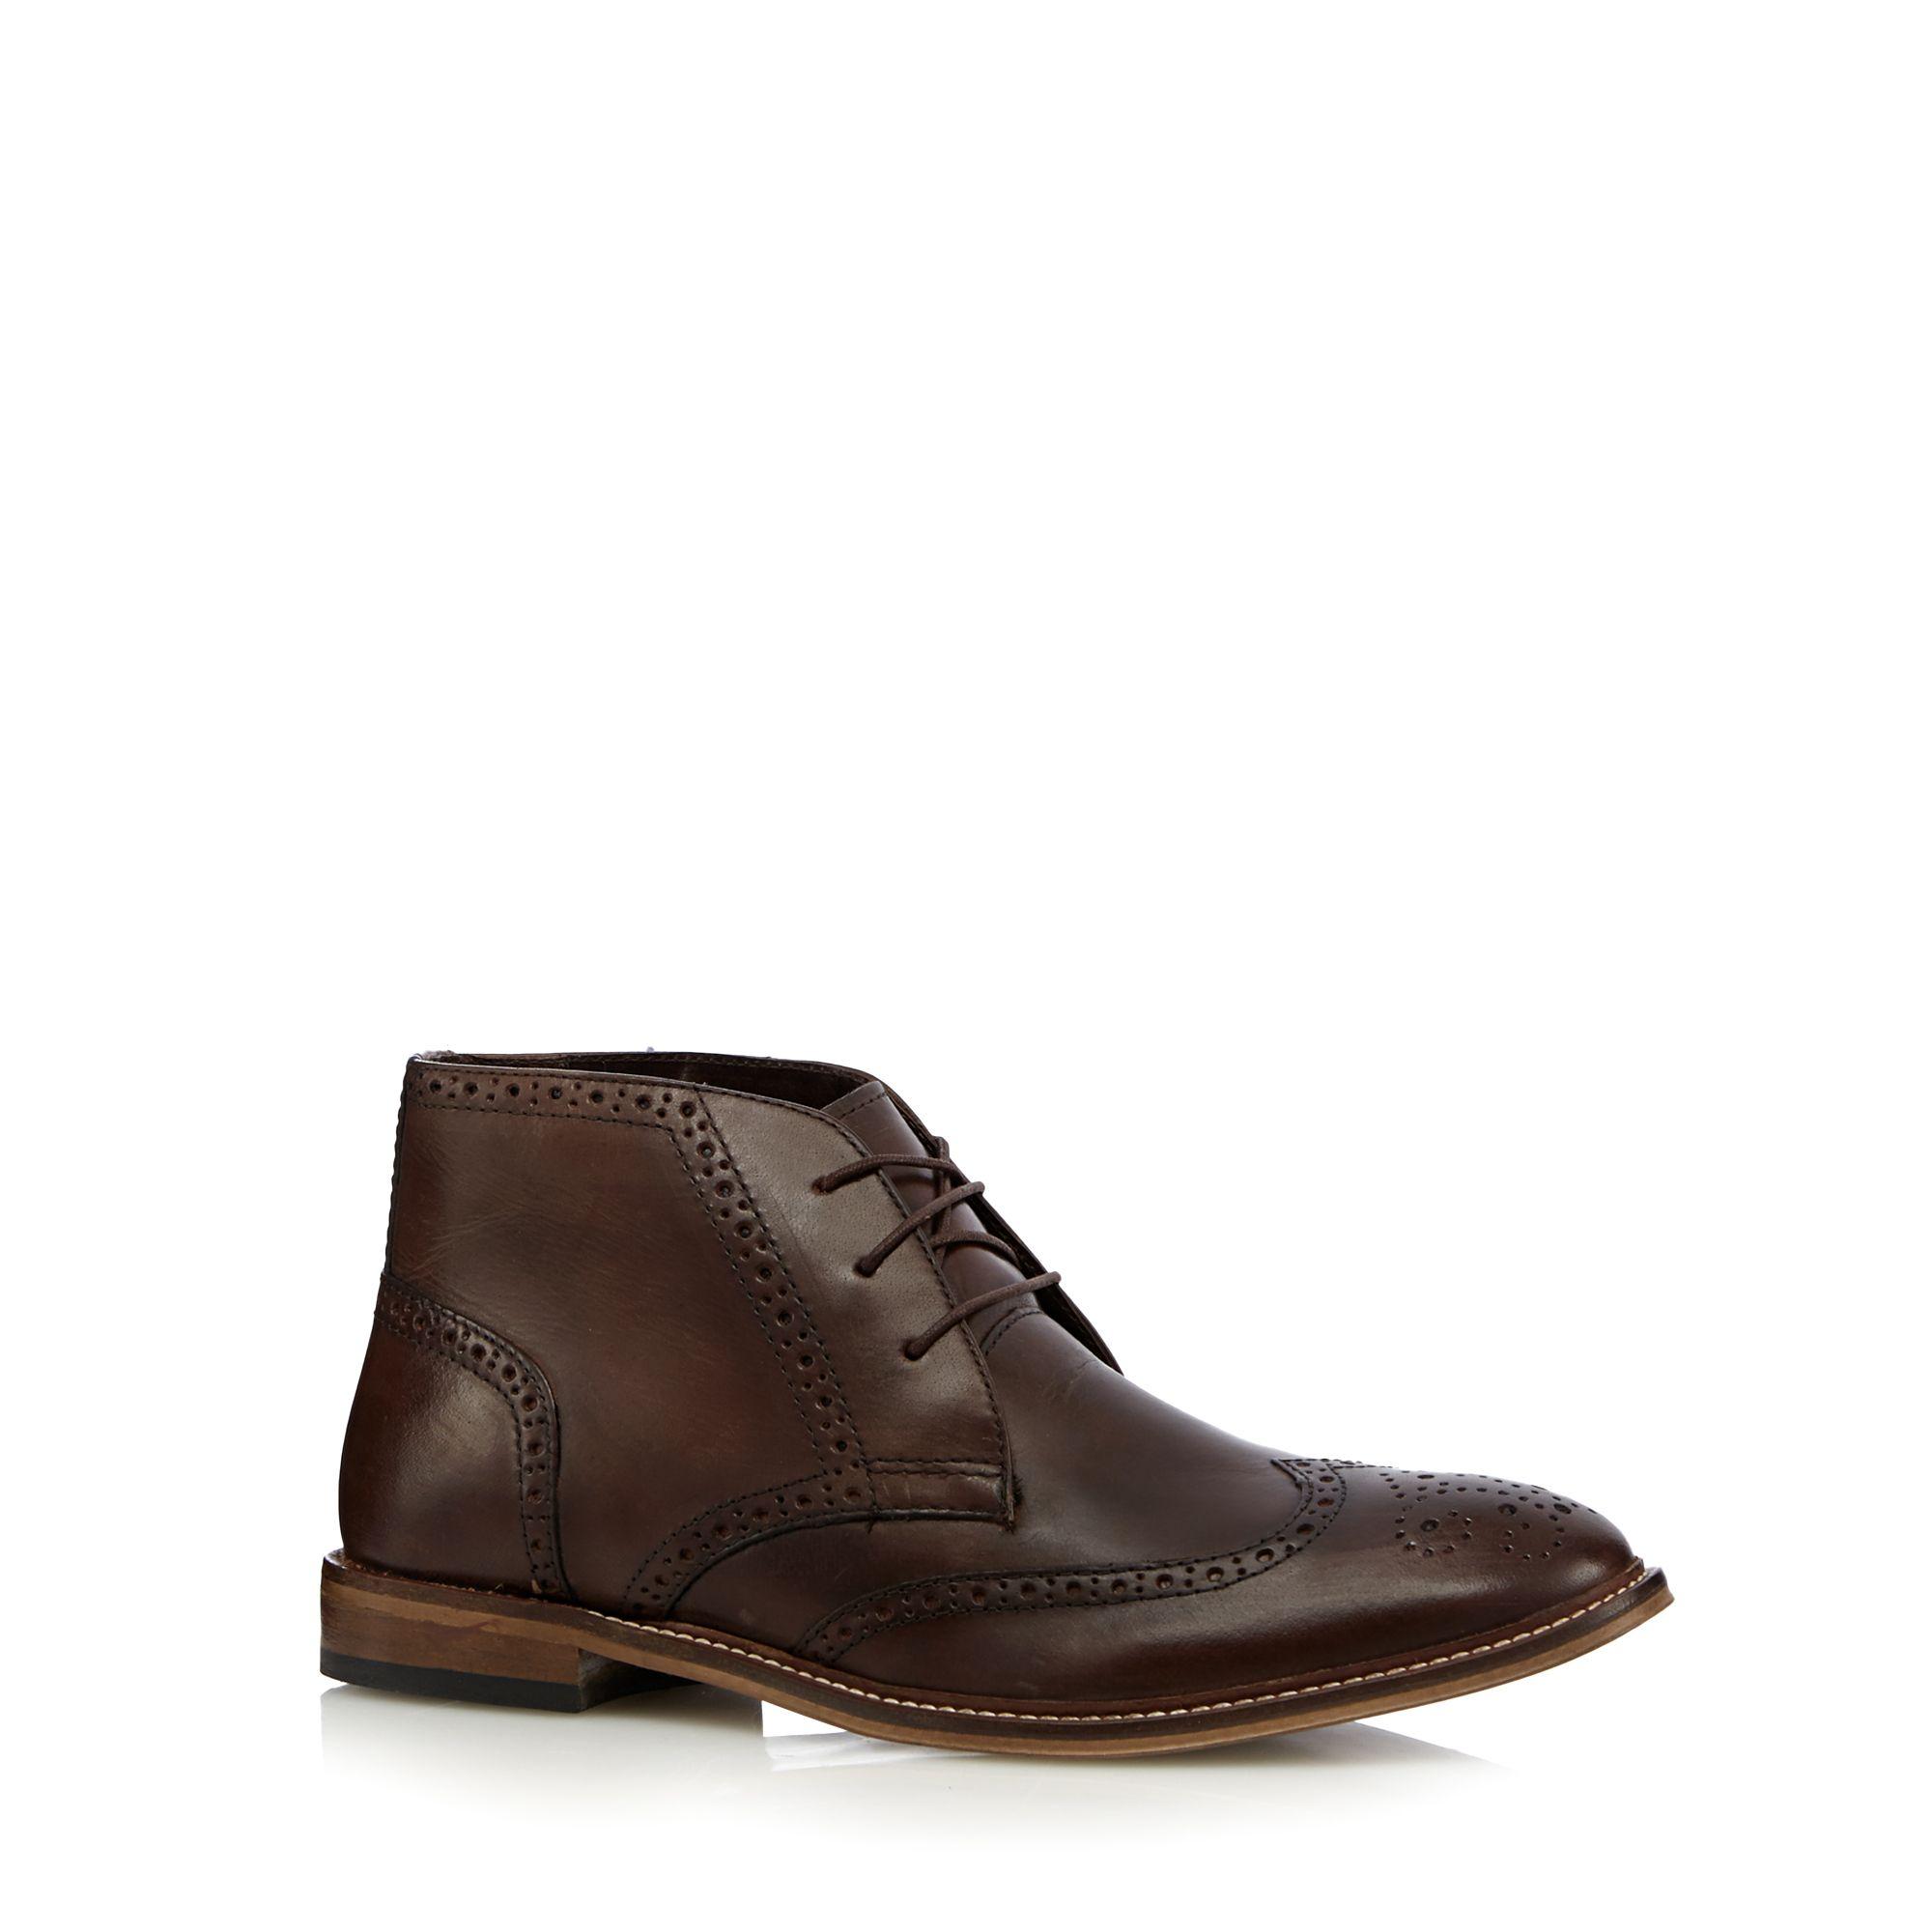 Debenhams Brown Shoes